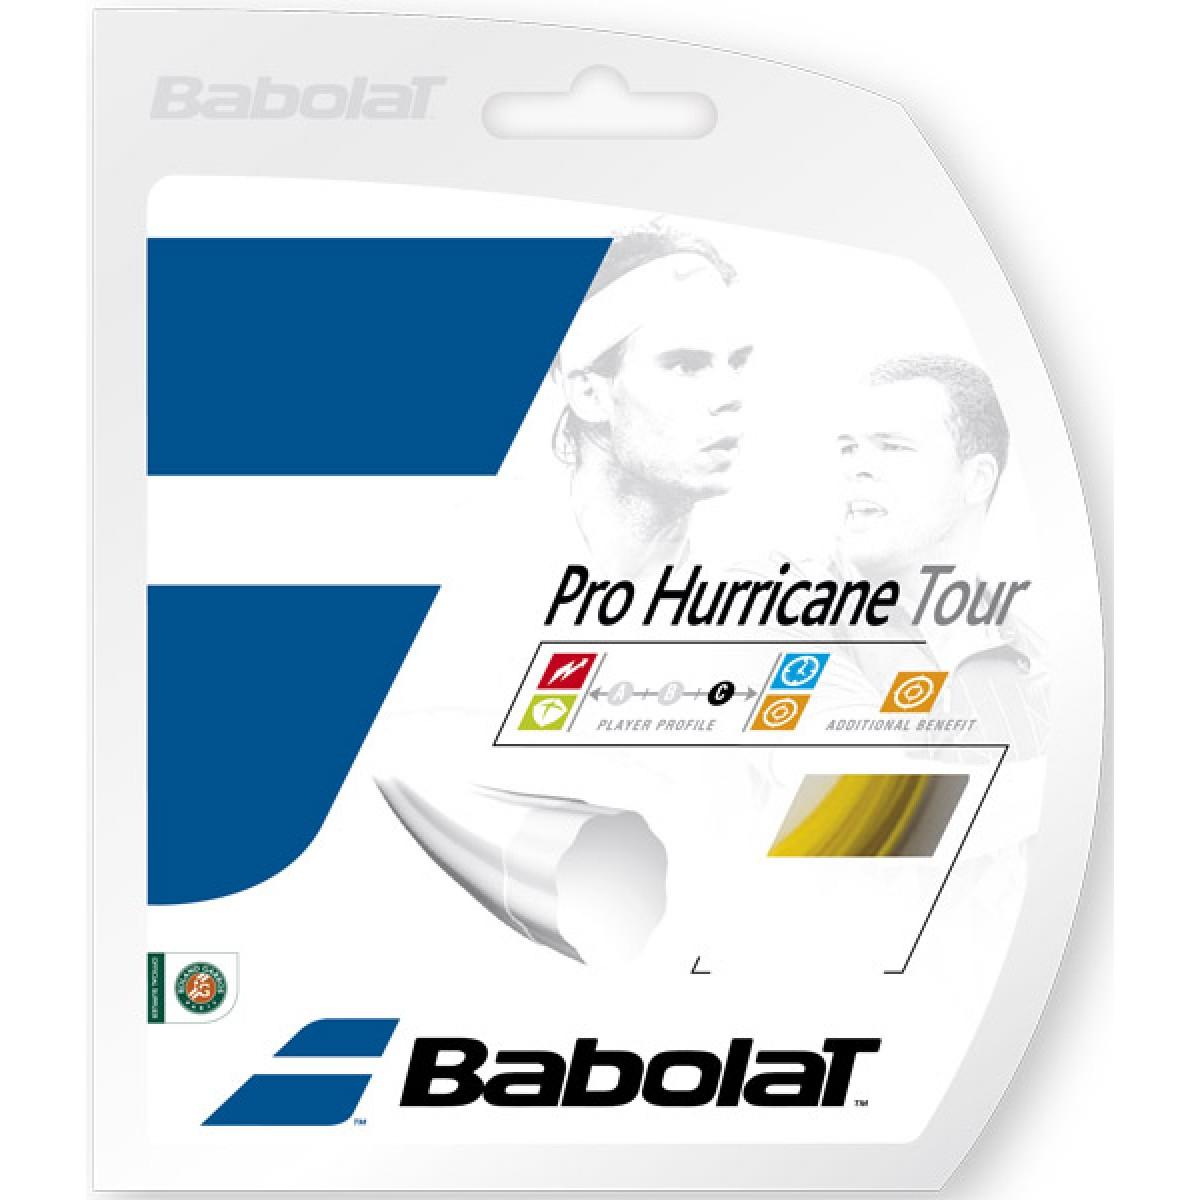 CORDAJE BABOLAT PRO HURRICANE TOUR (12 METROS)